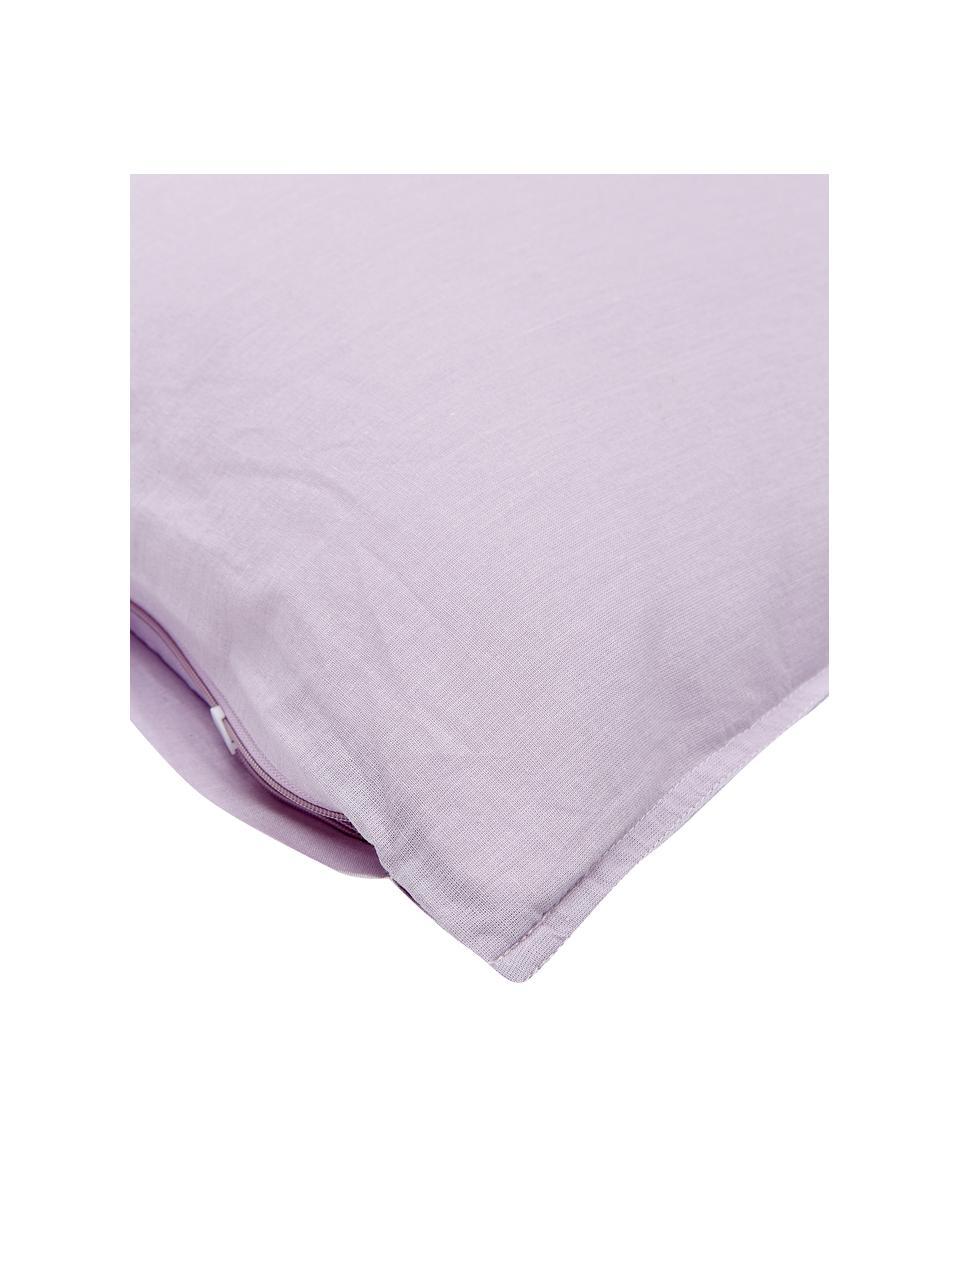 Poszewka na poduszkę z bawełny Arlene, 2 szt., Lila, S 40 x D 80 cm